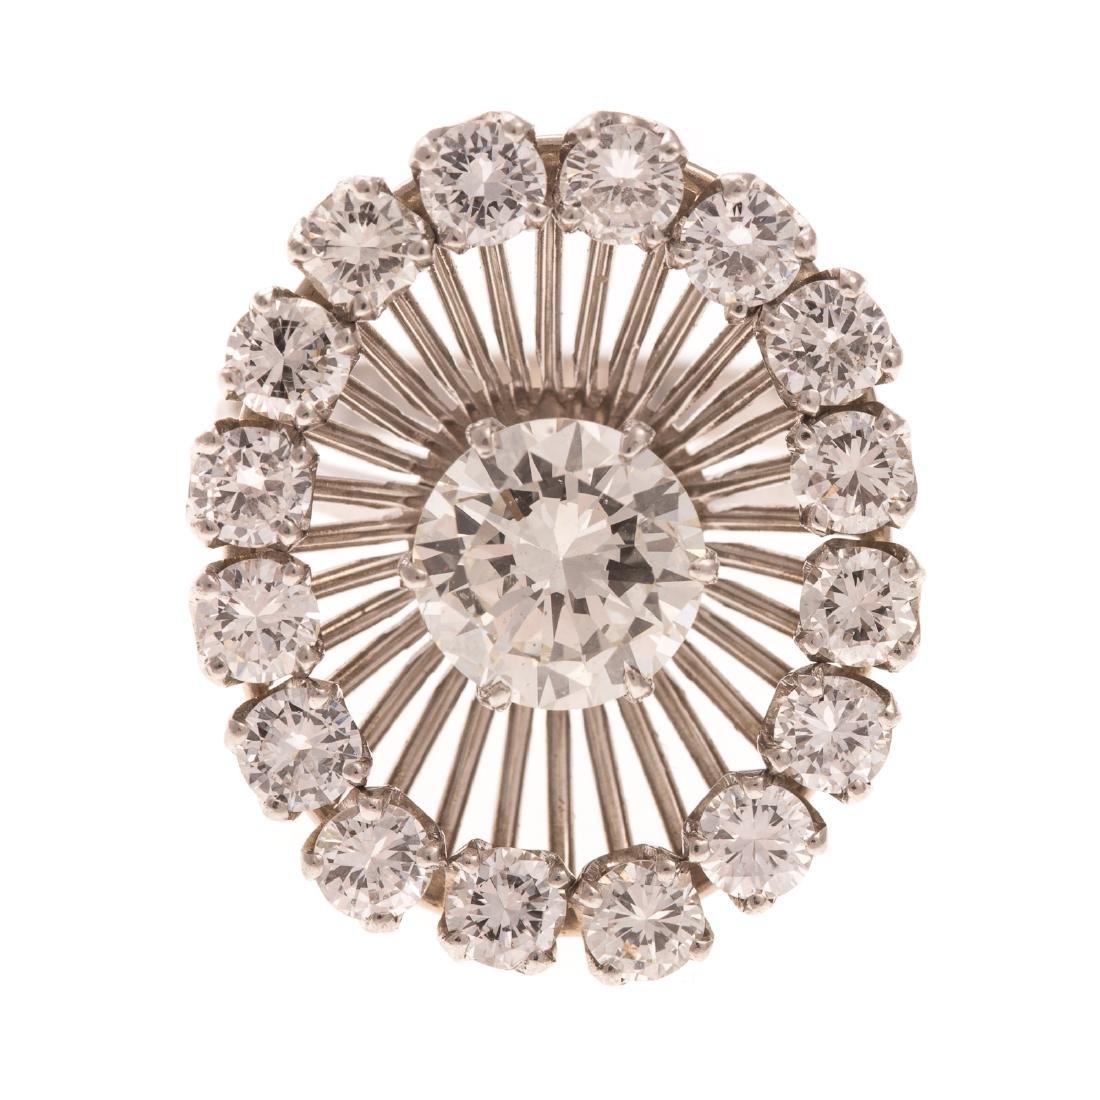 A Lady's Platinum Diamond Cocktail Ring